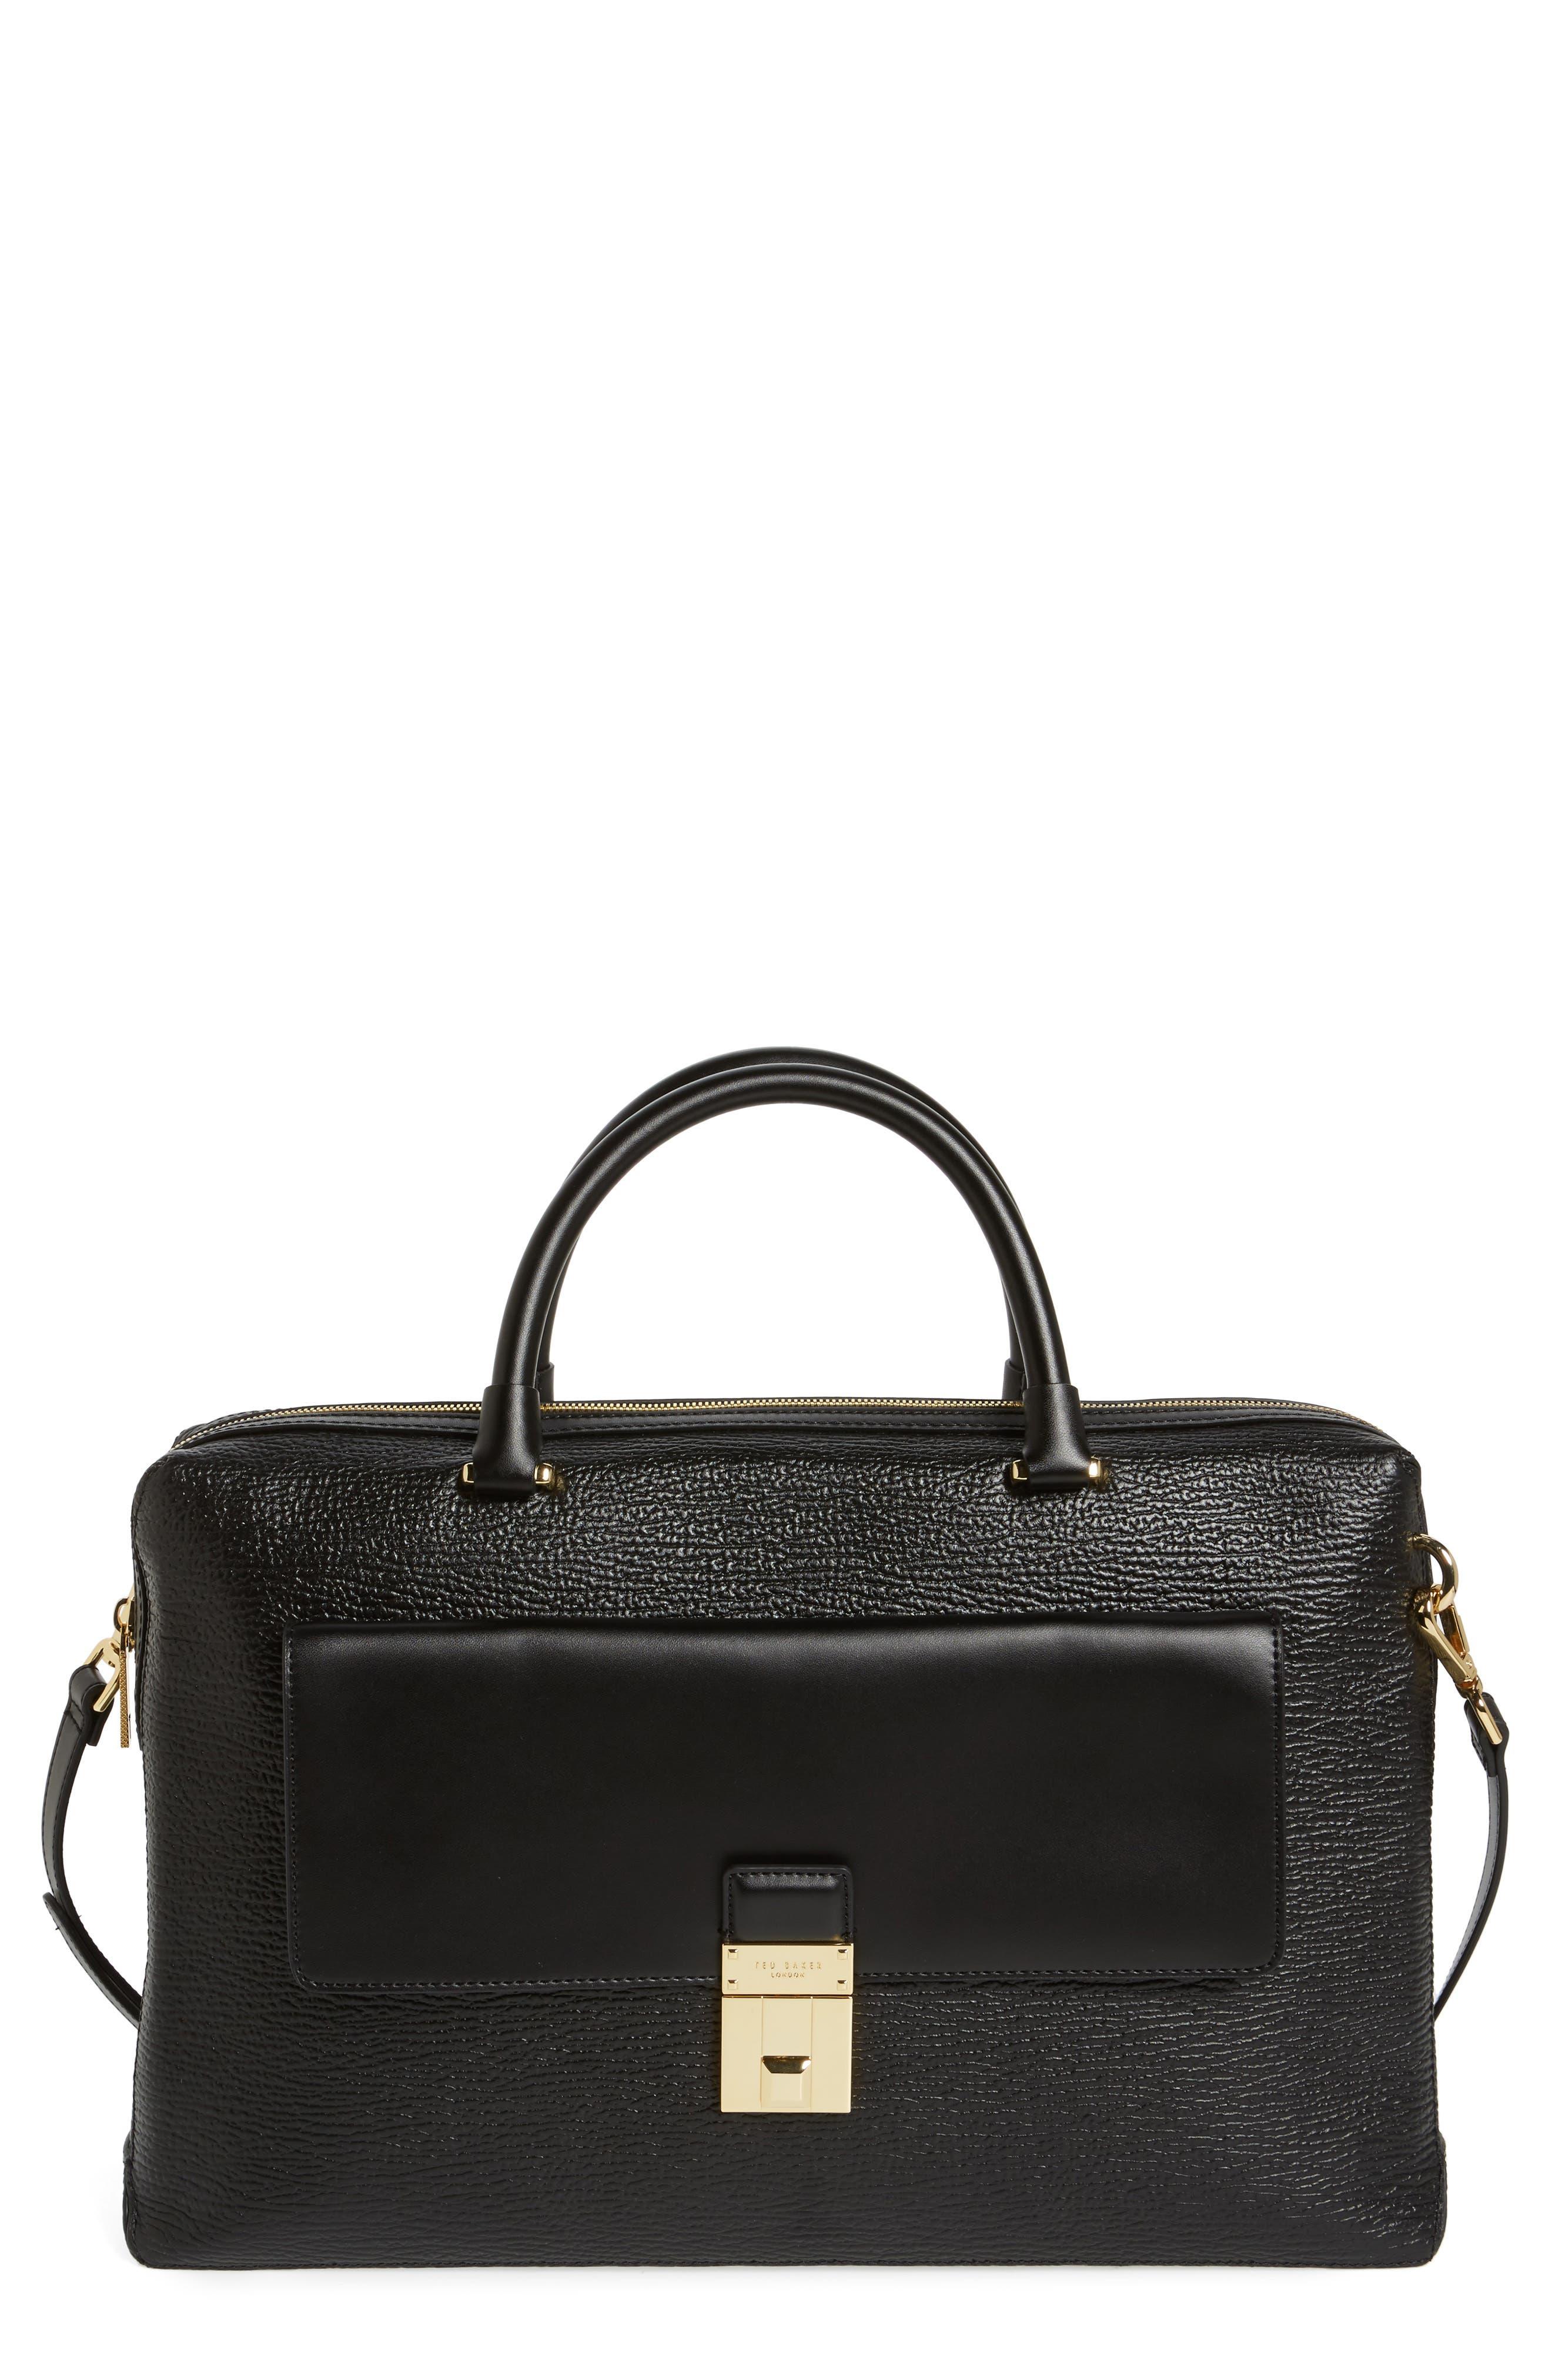 Ted Baker London Luggage Lock Leather Satchel